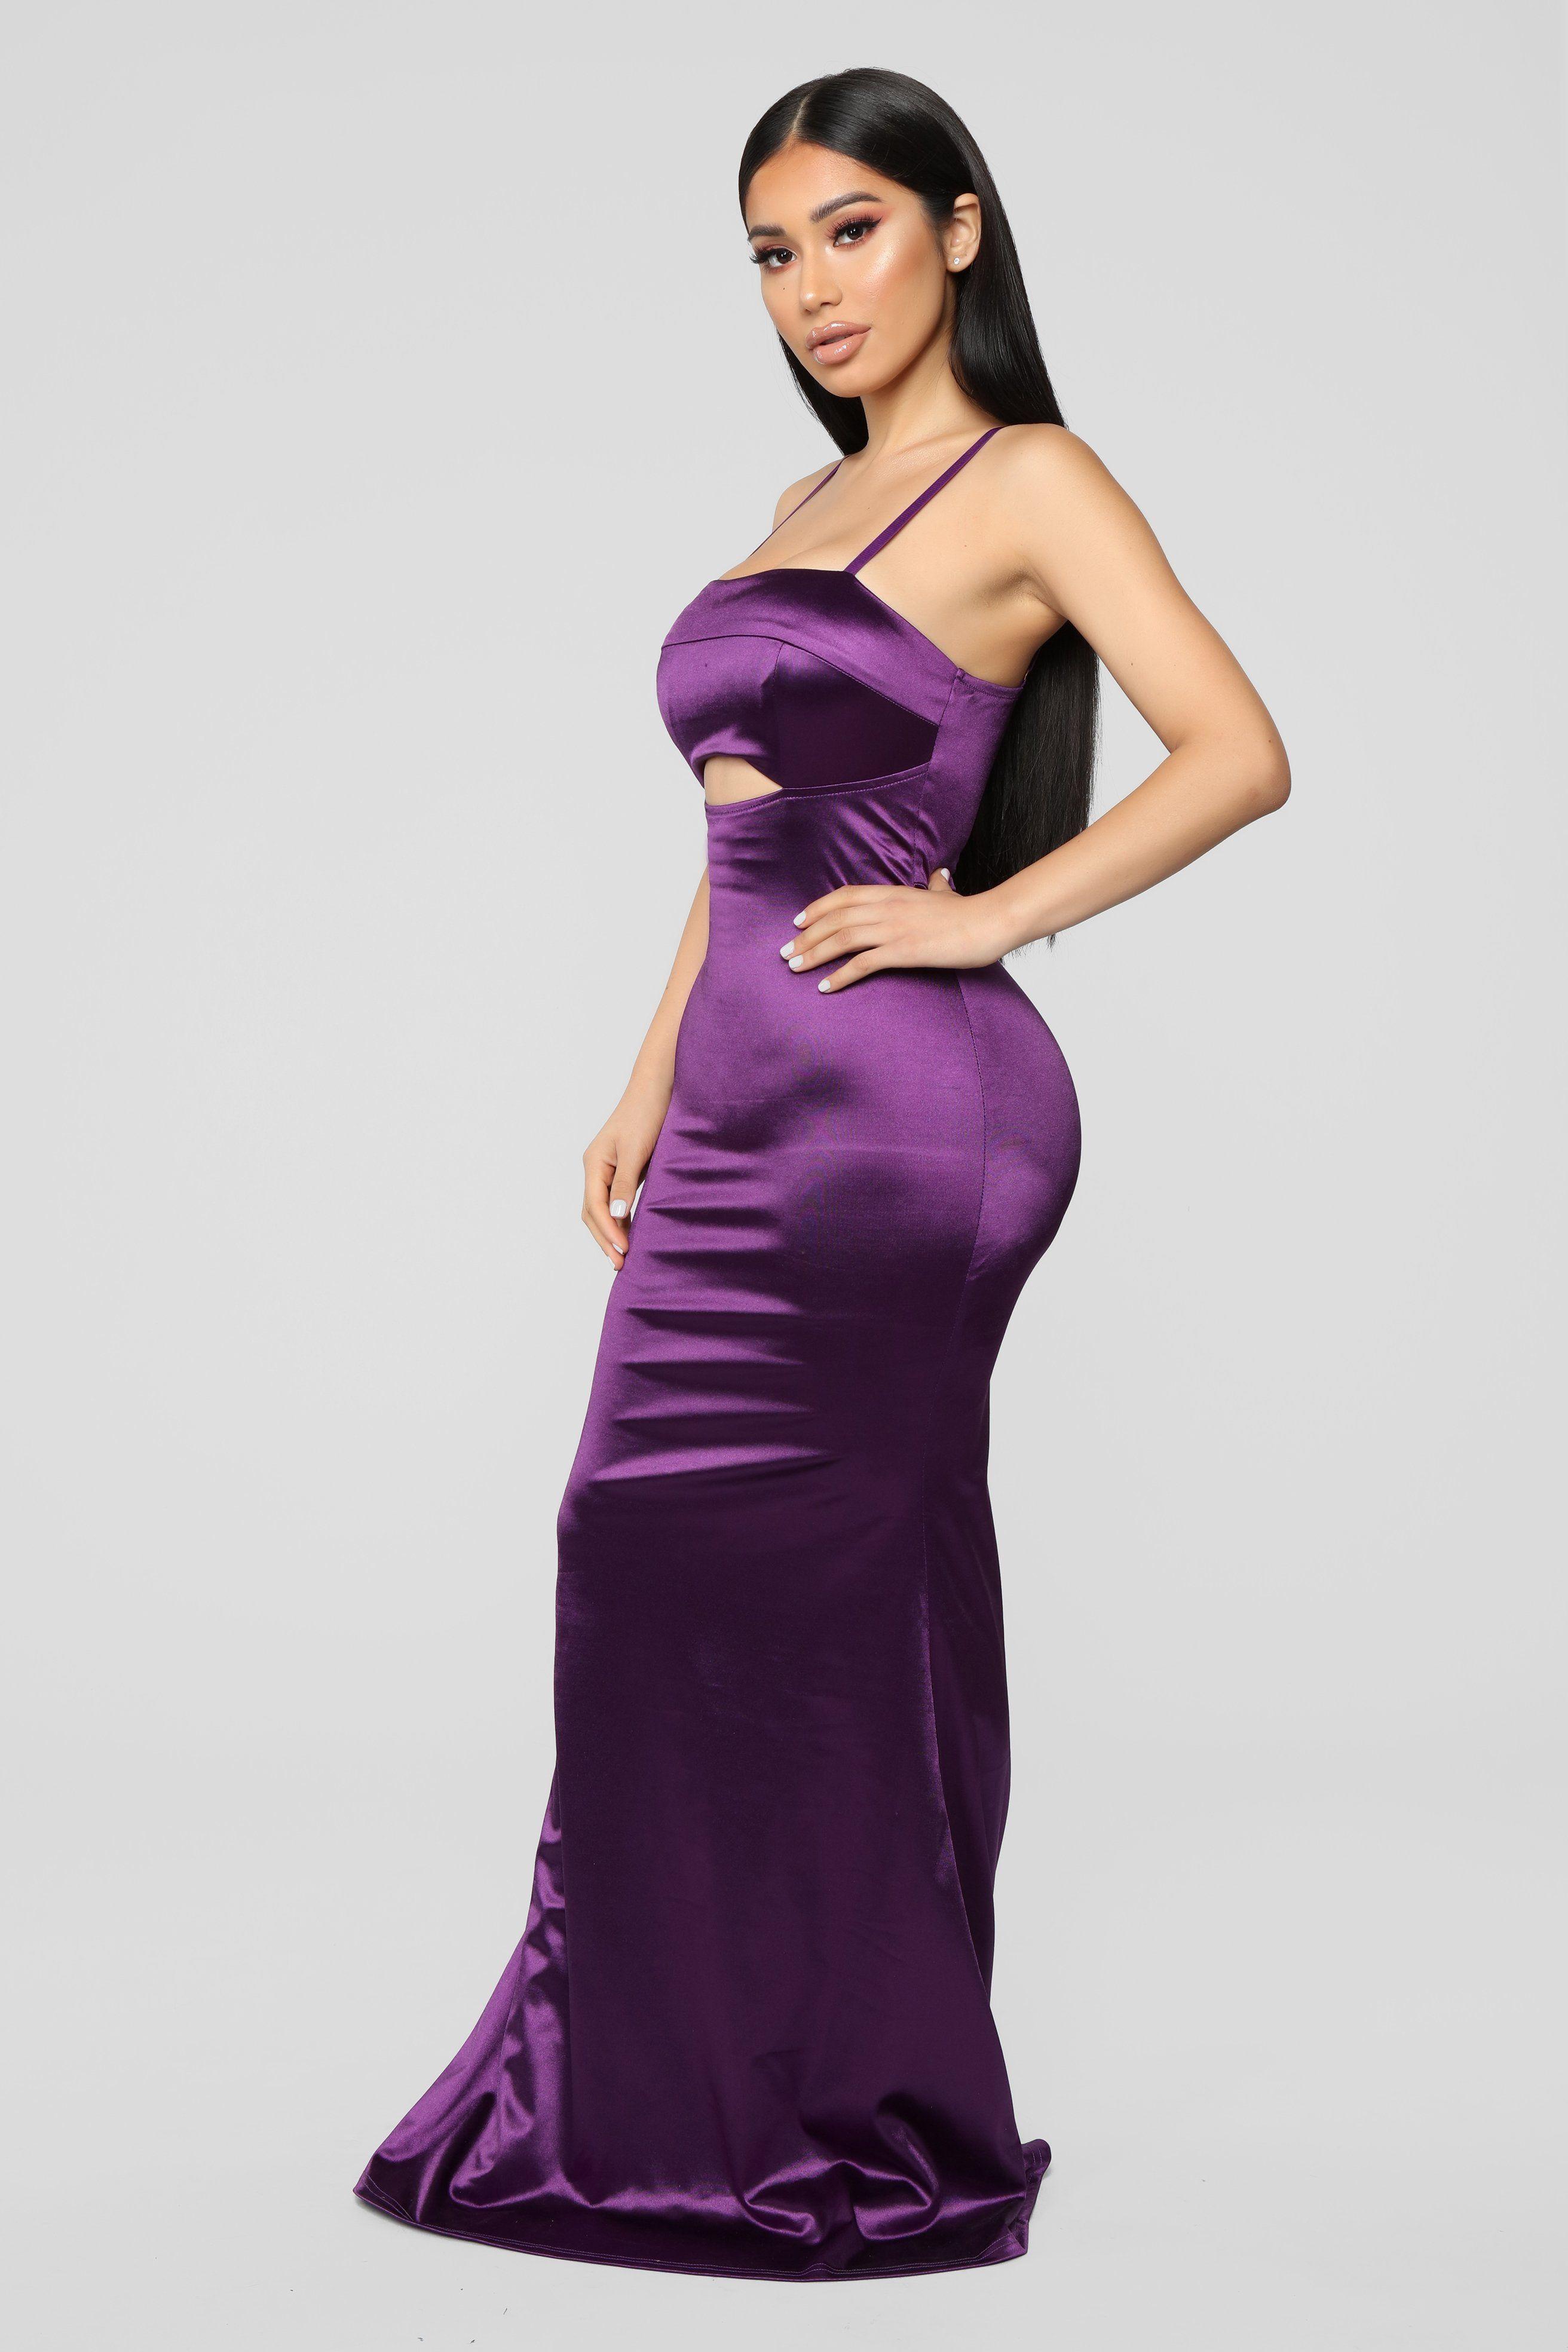 Gala Ready Satin Dress Purple Purple dress, Fashion